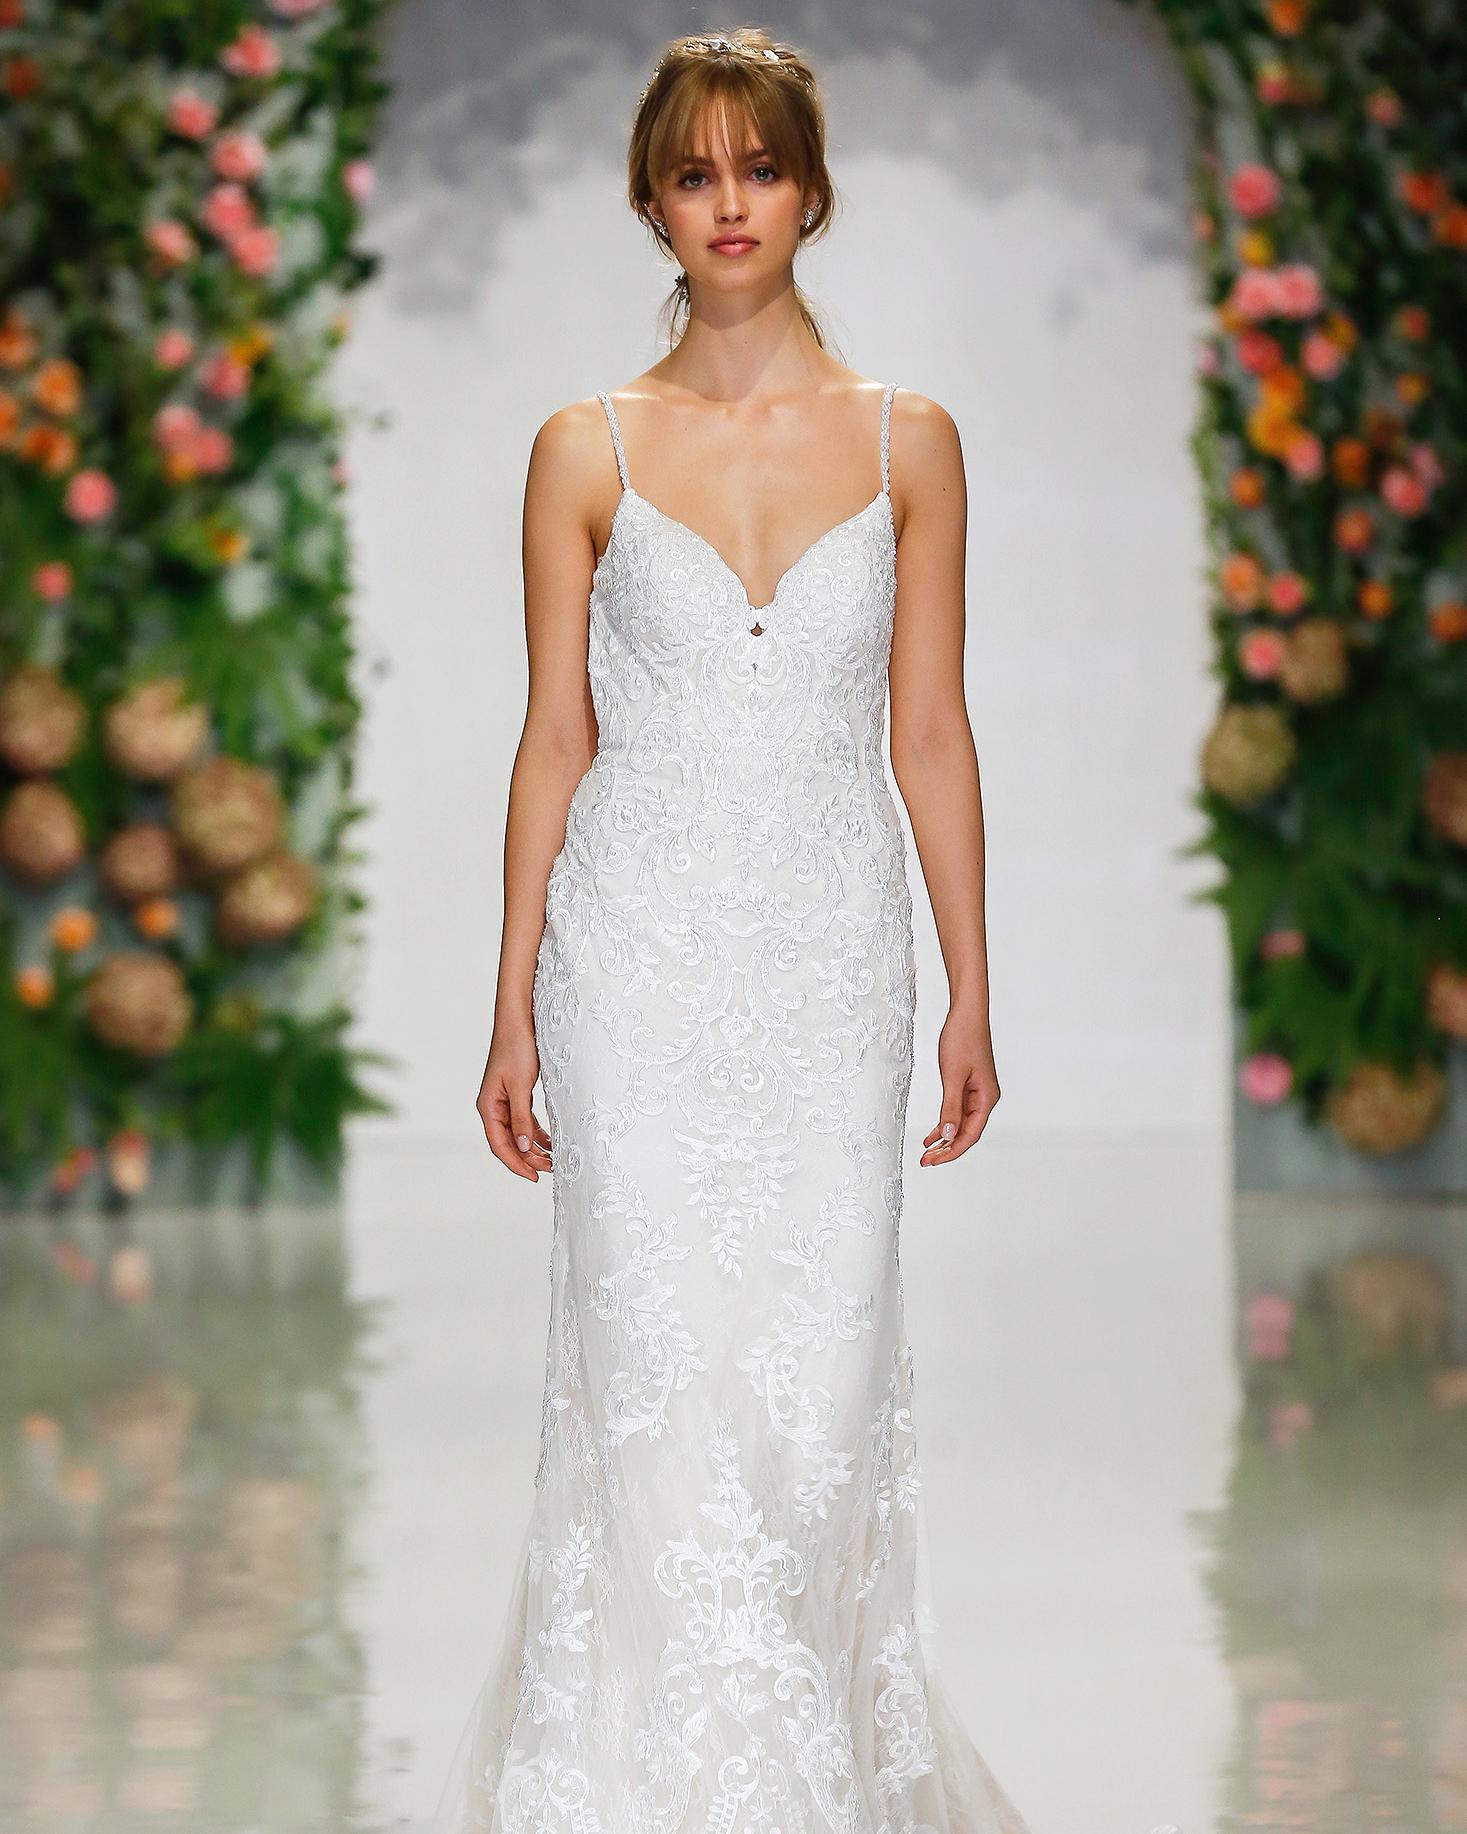 morilee madeline gardner wedding dress sweetheart spaghetti-strap sheath